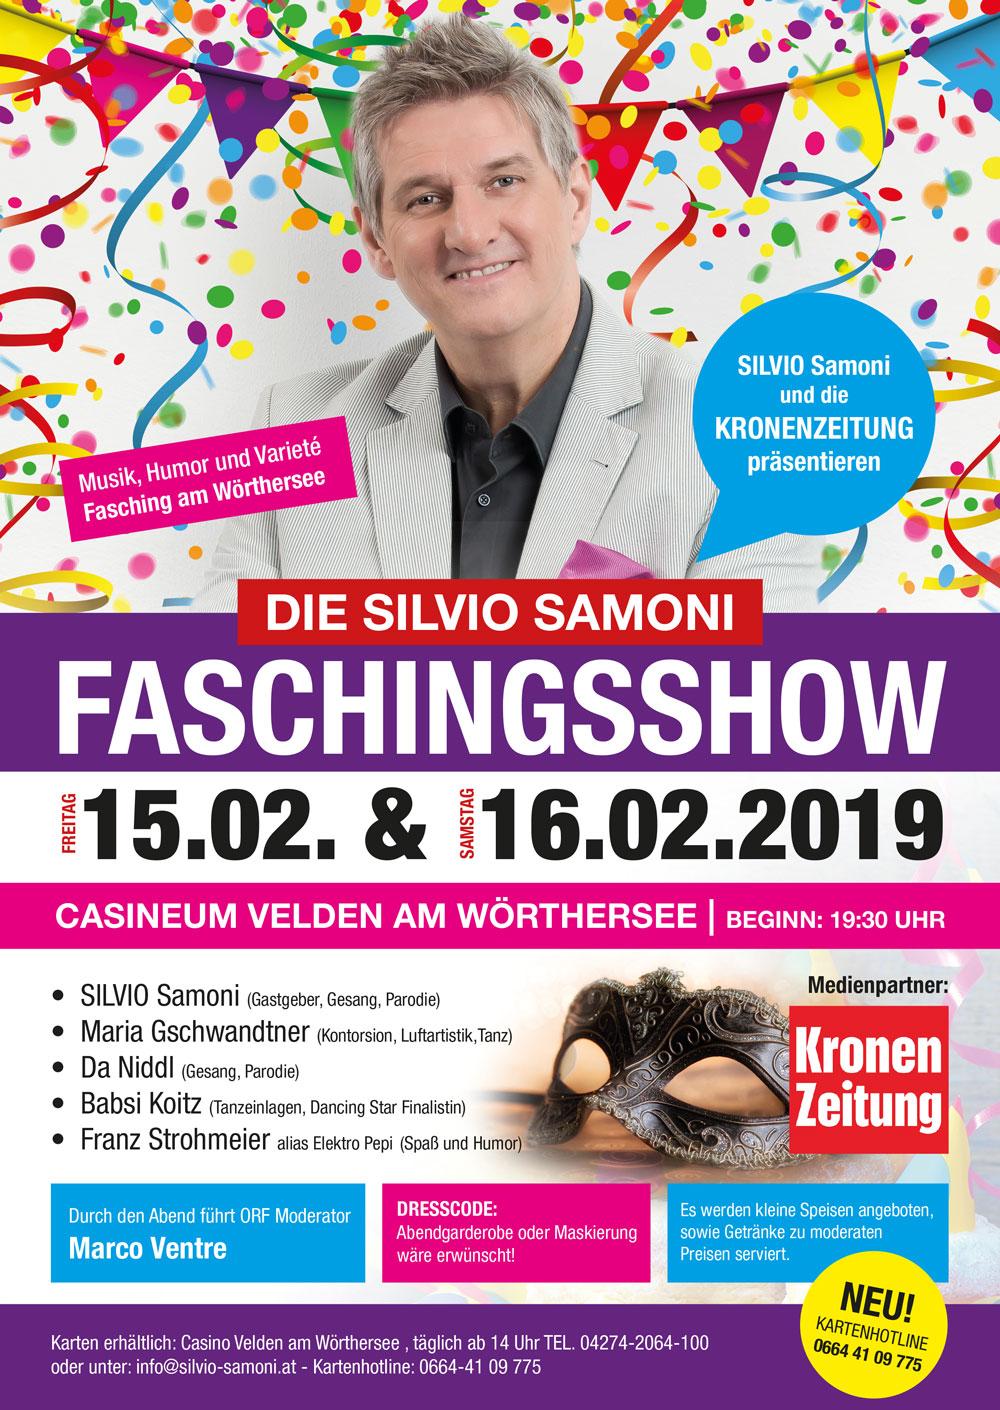 Die Silvio Samoni Fachingsshow